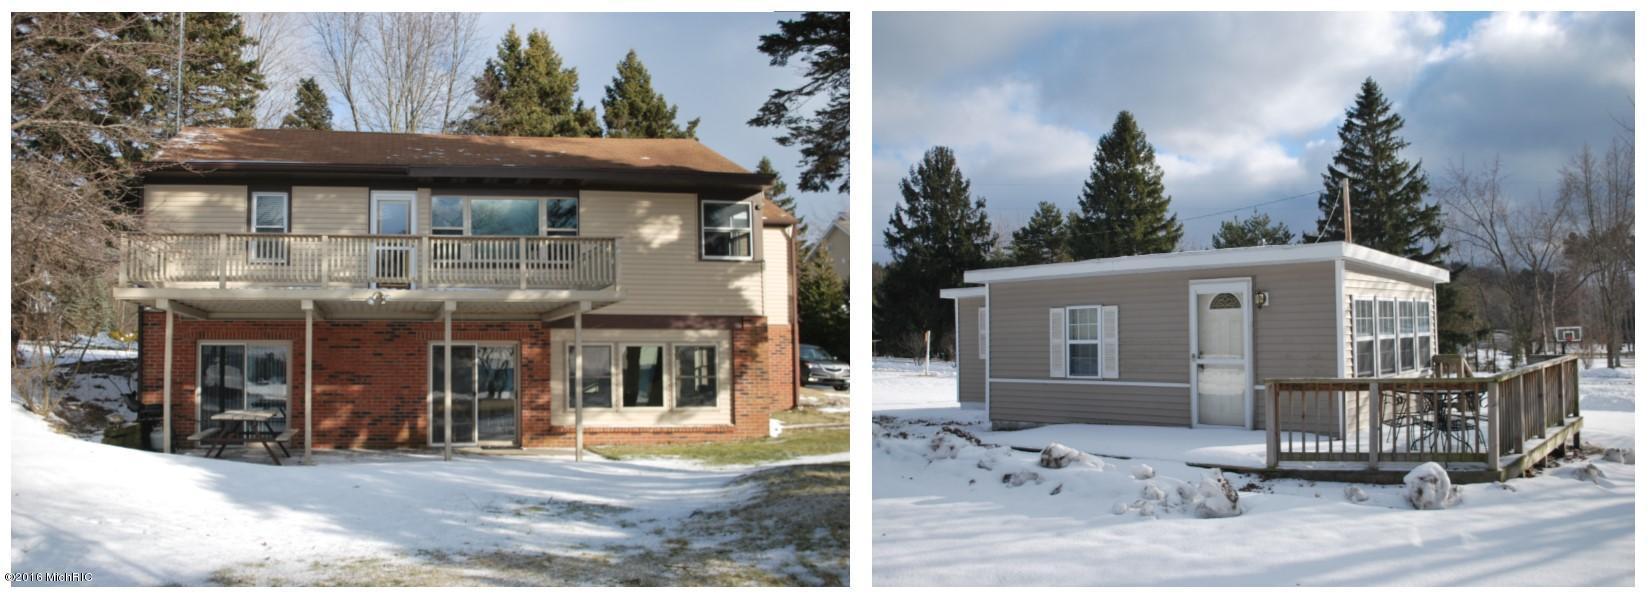 Land for Sale at 5491 LAKESHORE Ludington, Michigan 49431 United States